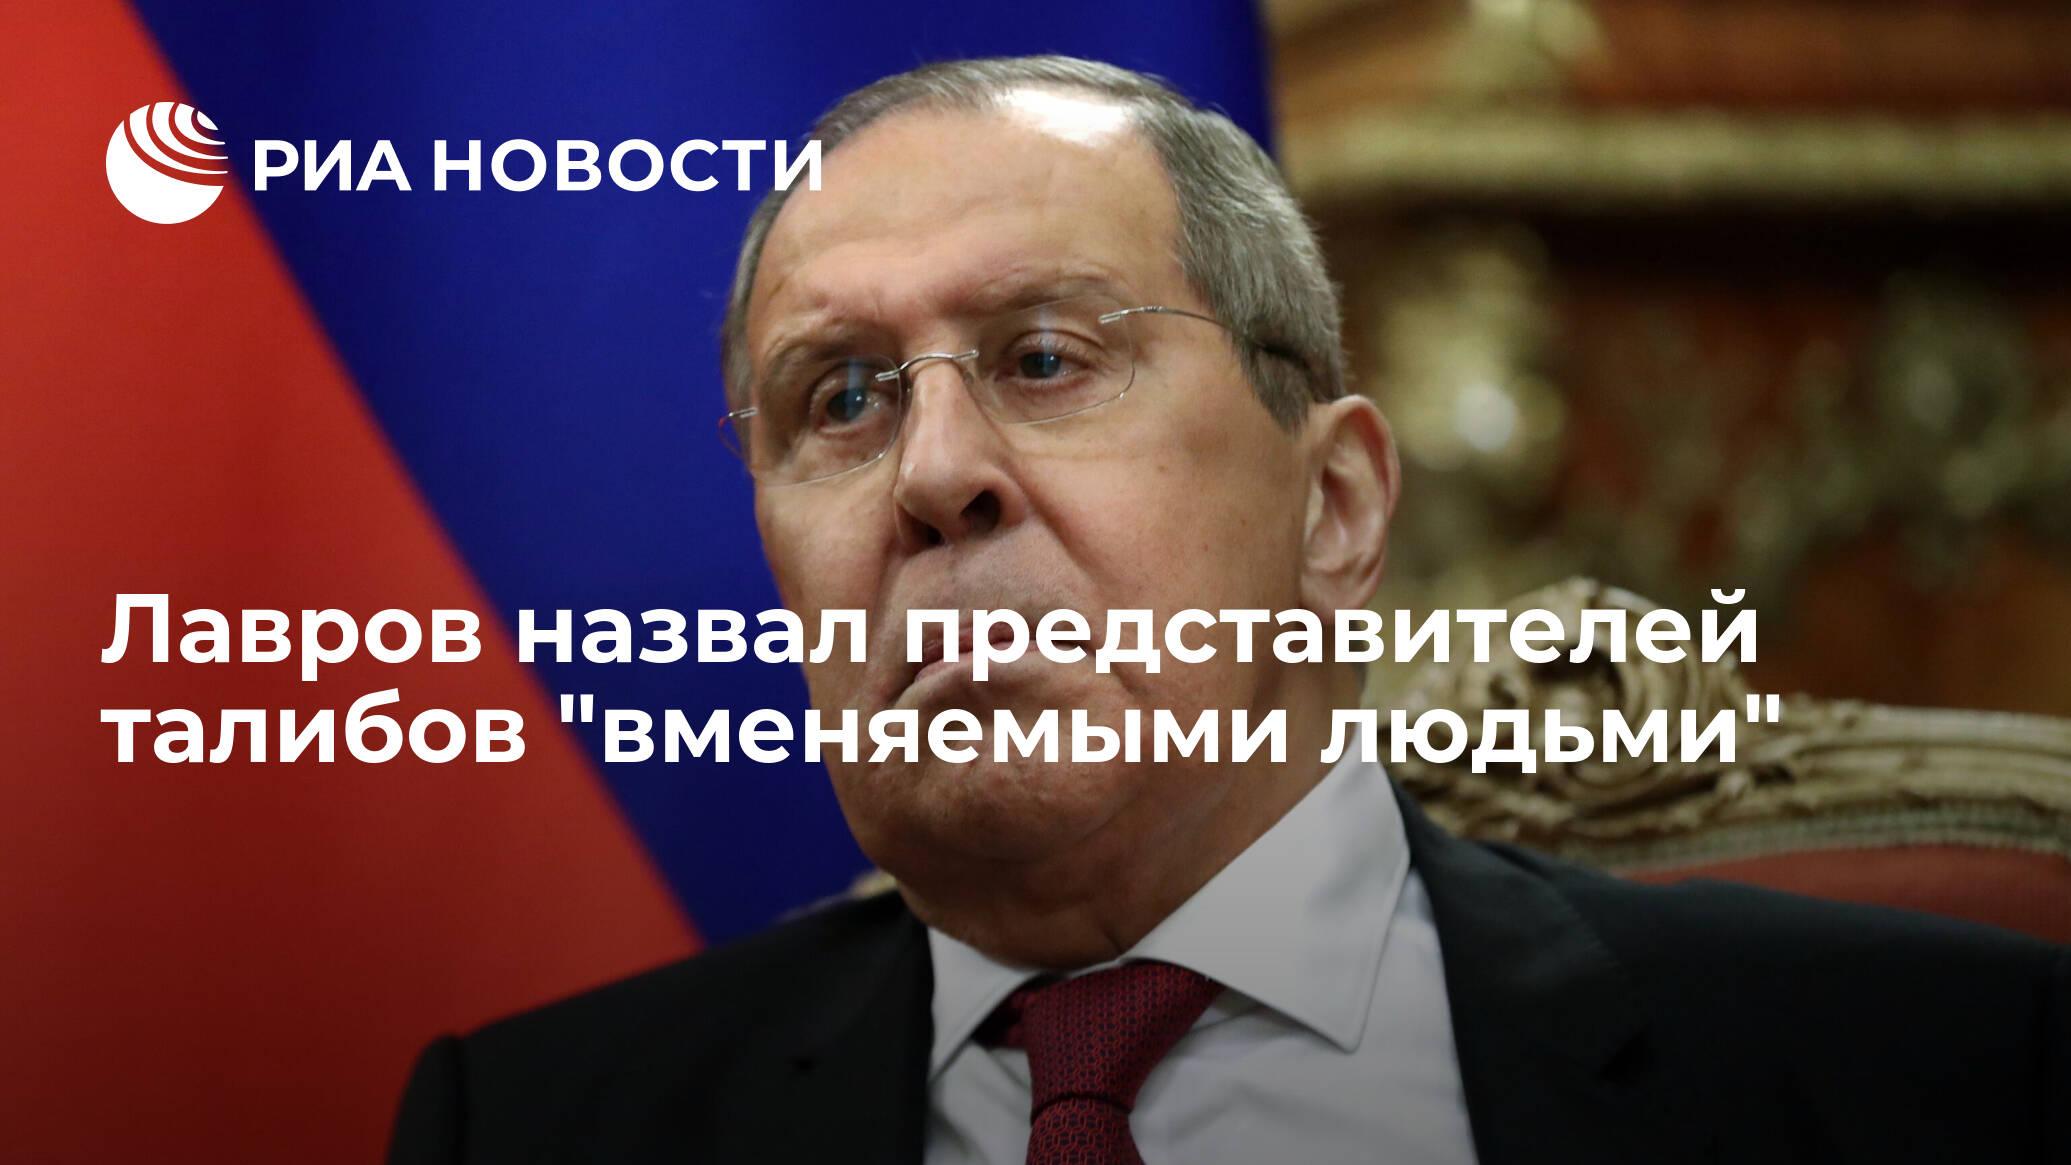 https://cdn21.img.ria.ru/images/sharing/article/1742529842.jpg?17423785721627033742